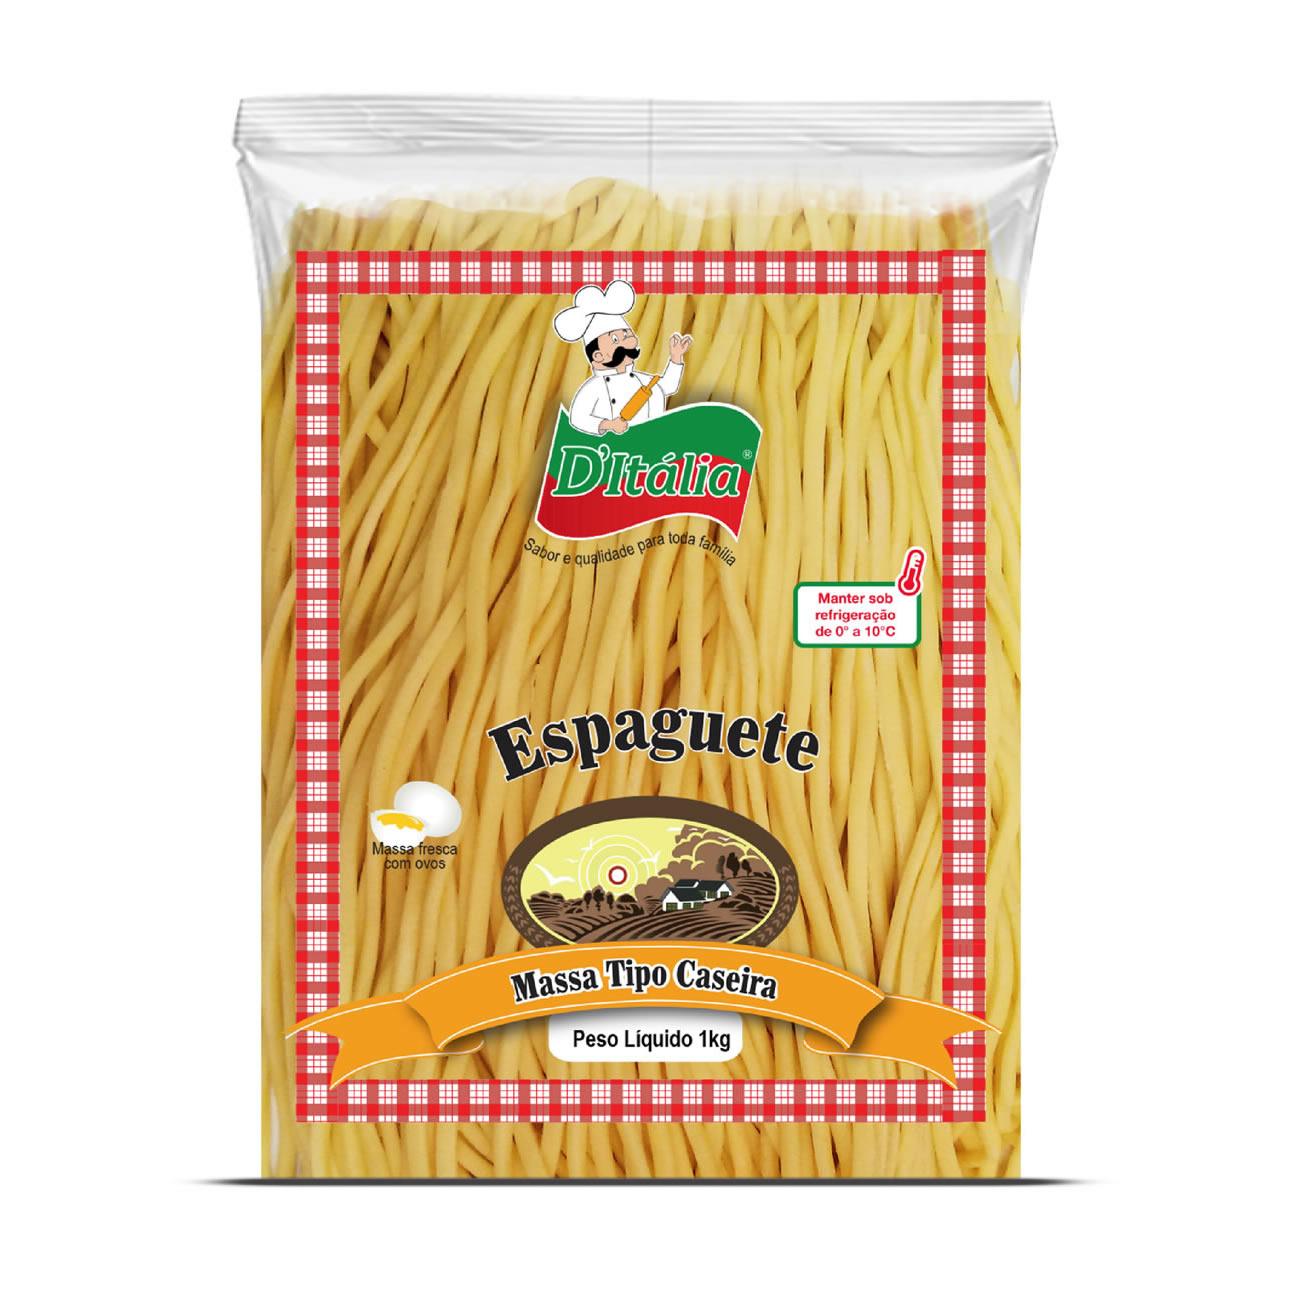 Massa Fresca Espaguete Caseira